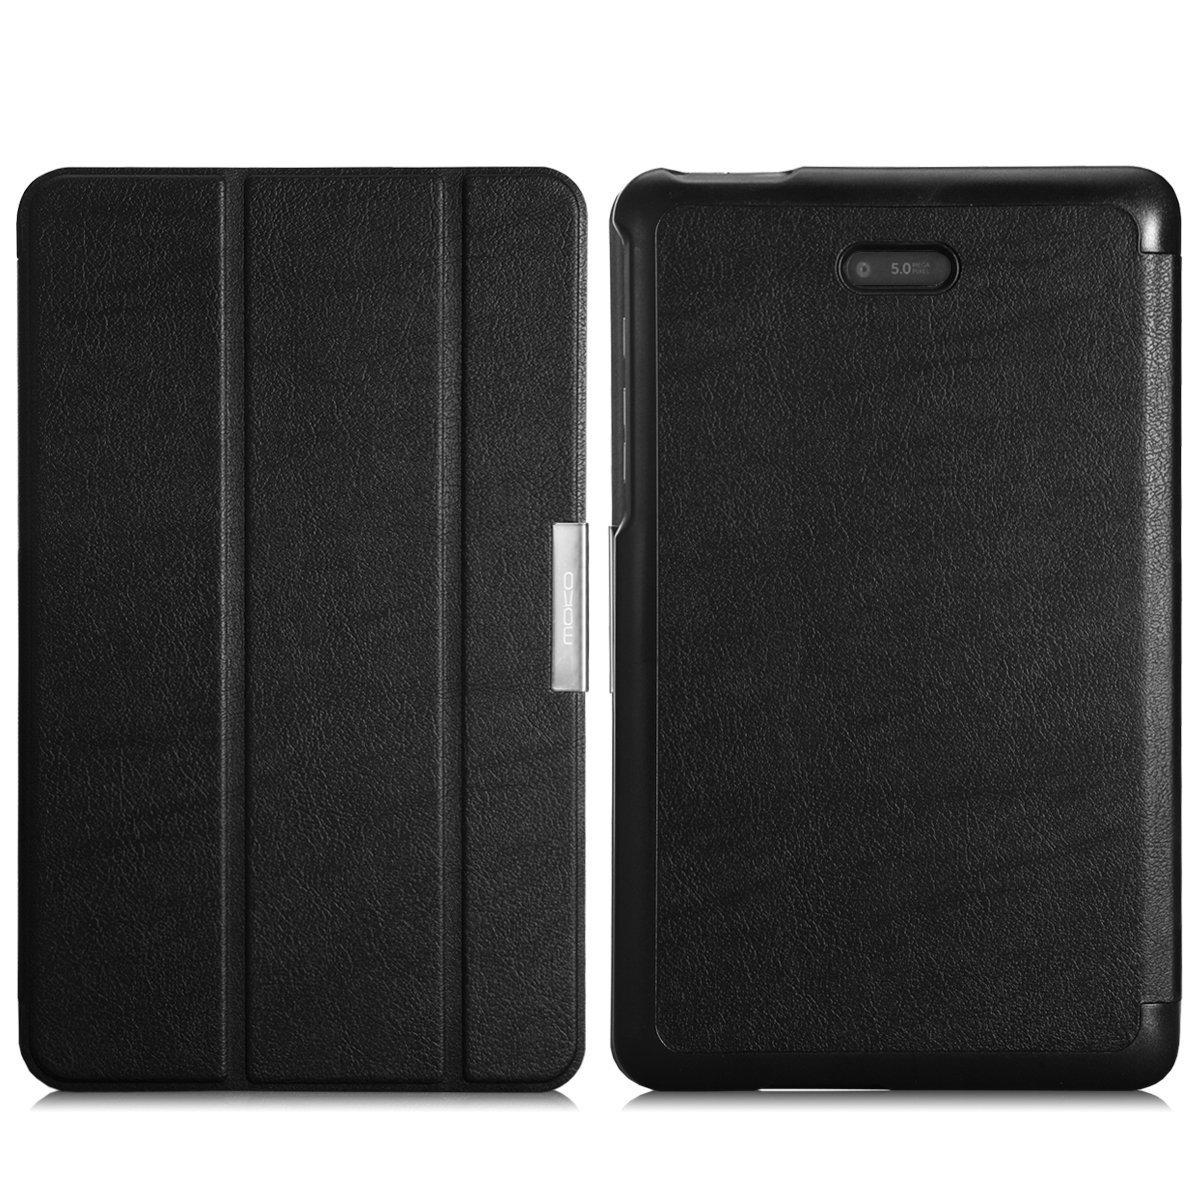 LG G Pad X 8.0 Case,Black Pu Leather Tablet 8 inch Case(V520 V521 V525)